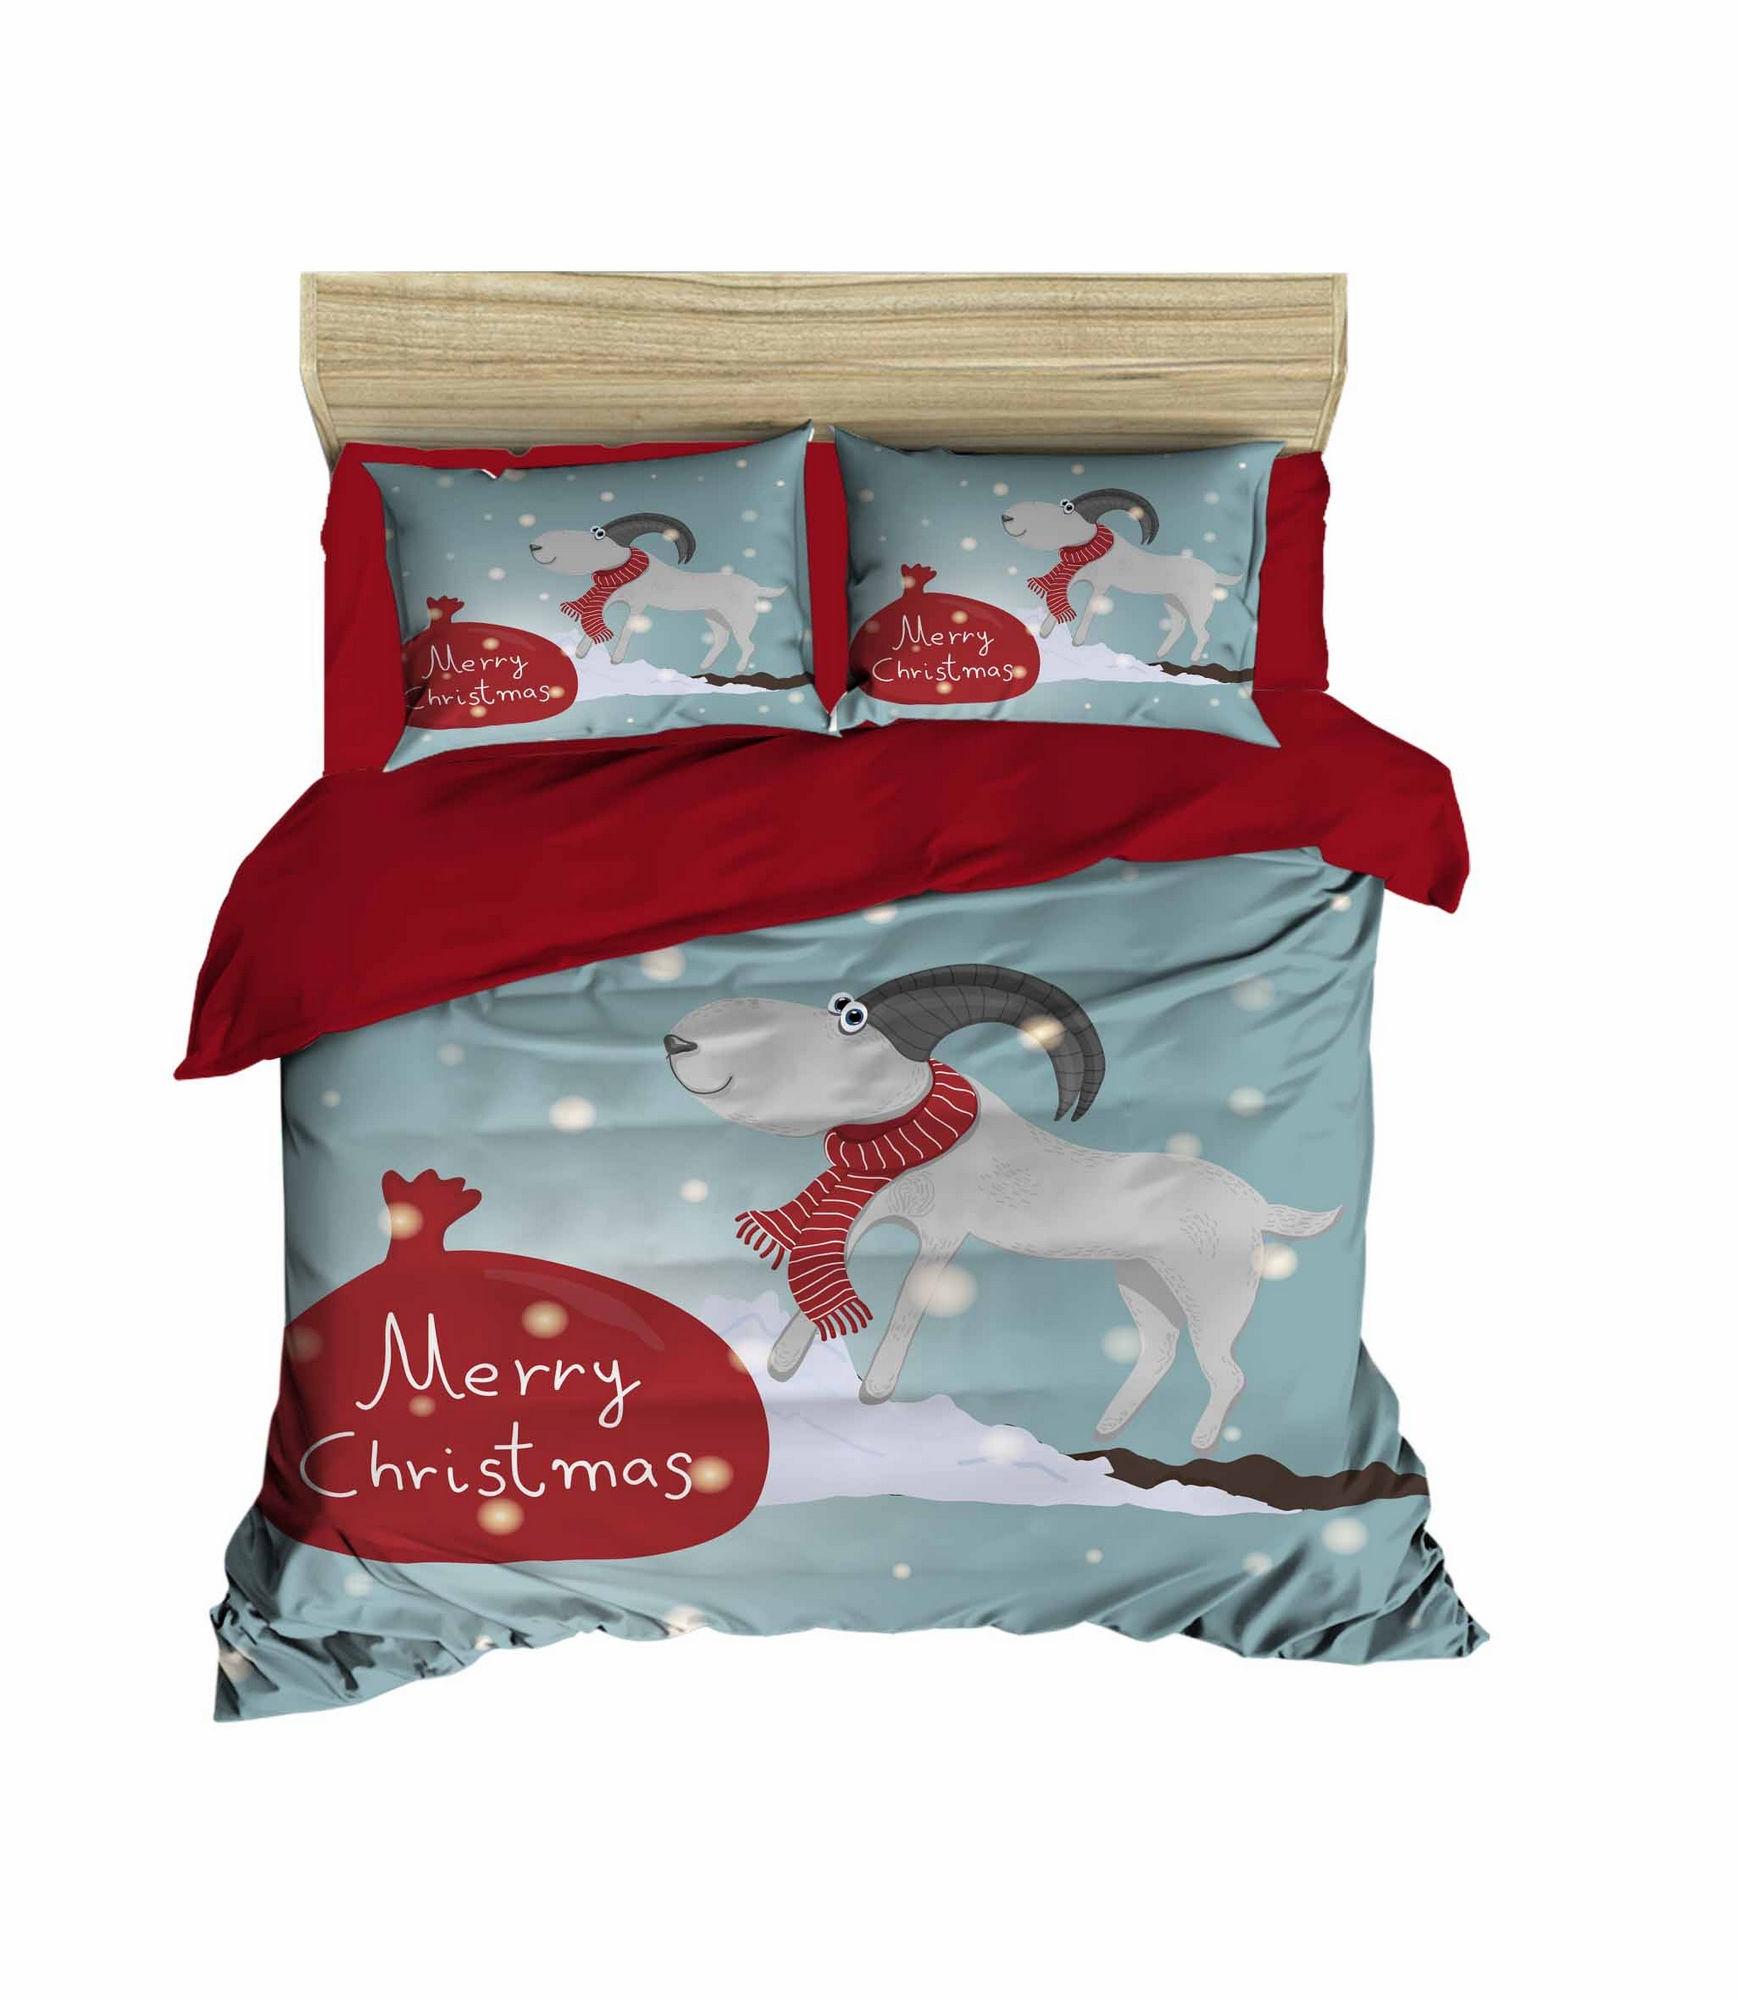 Lenjerie de pat din bumbac si microfibra Christmas 468 Multicolor, 200 x 220 cm